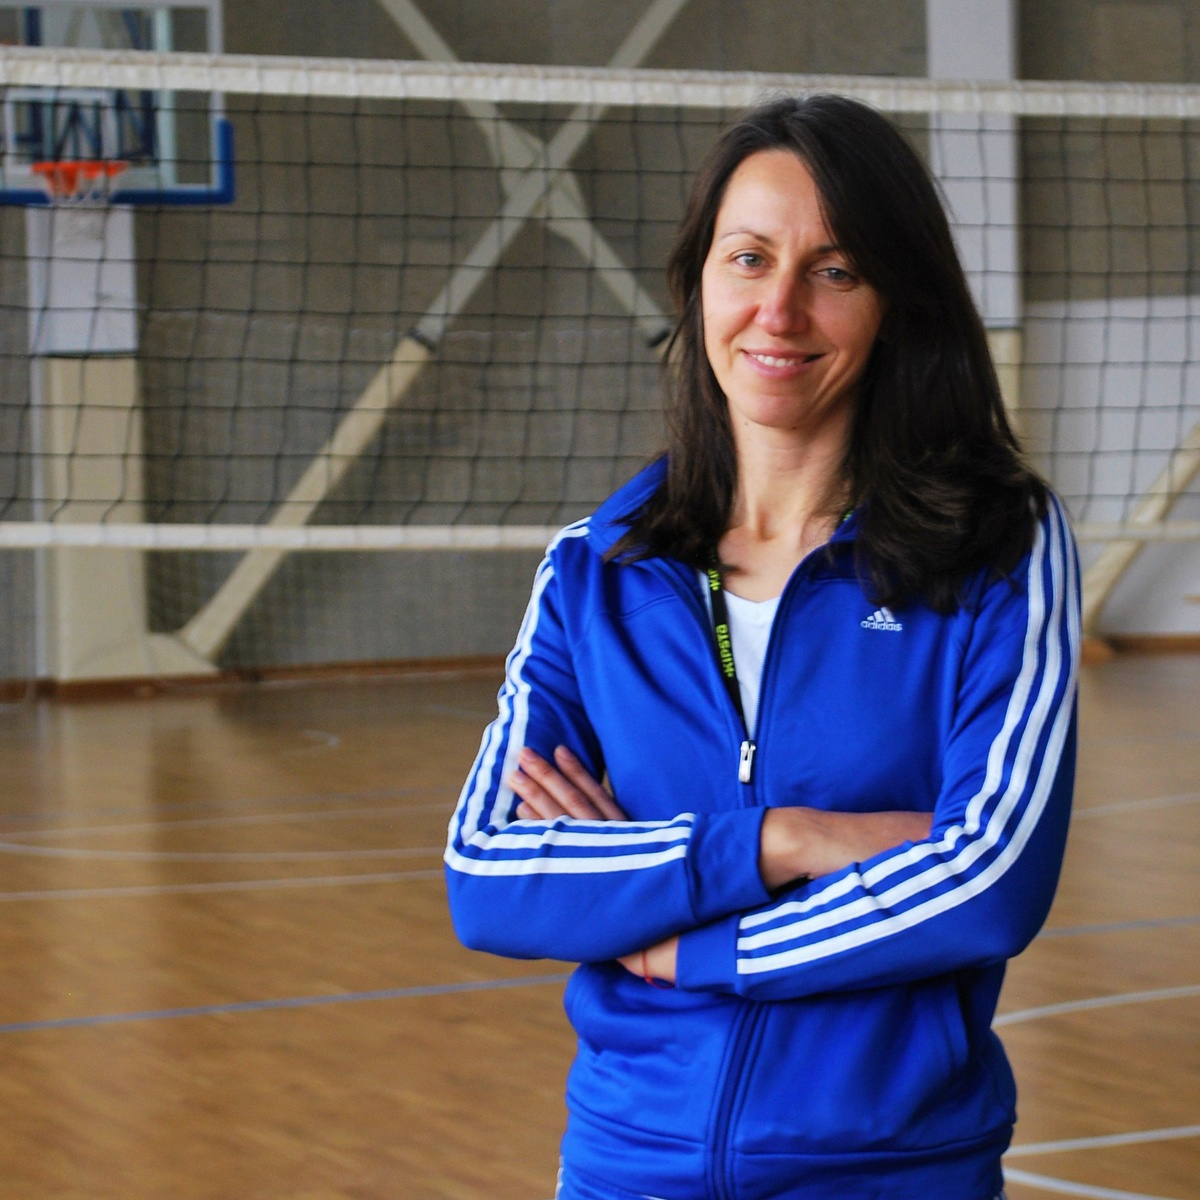 Полина Димитрова